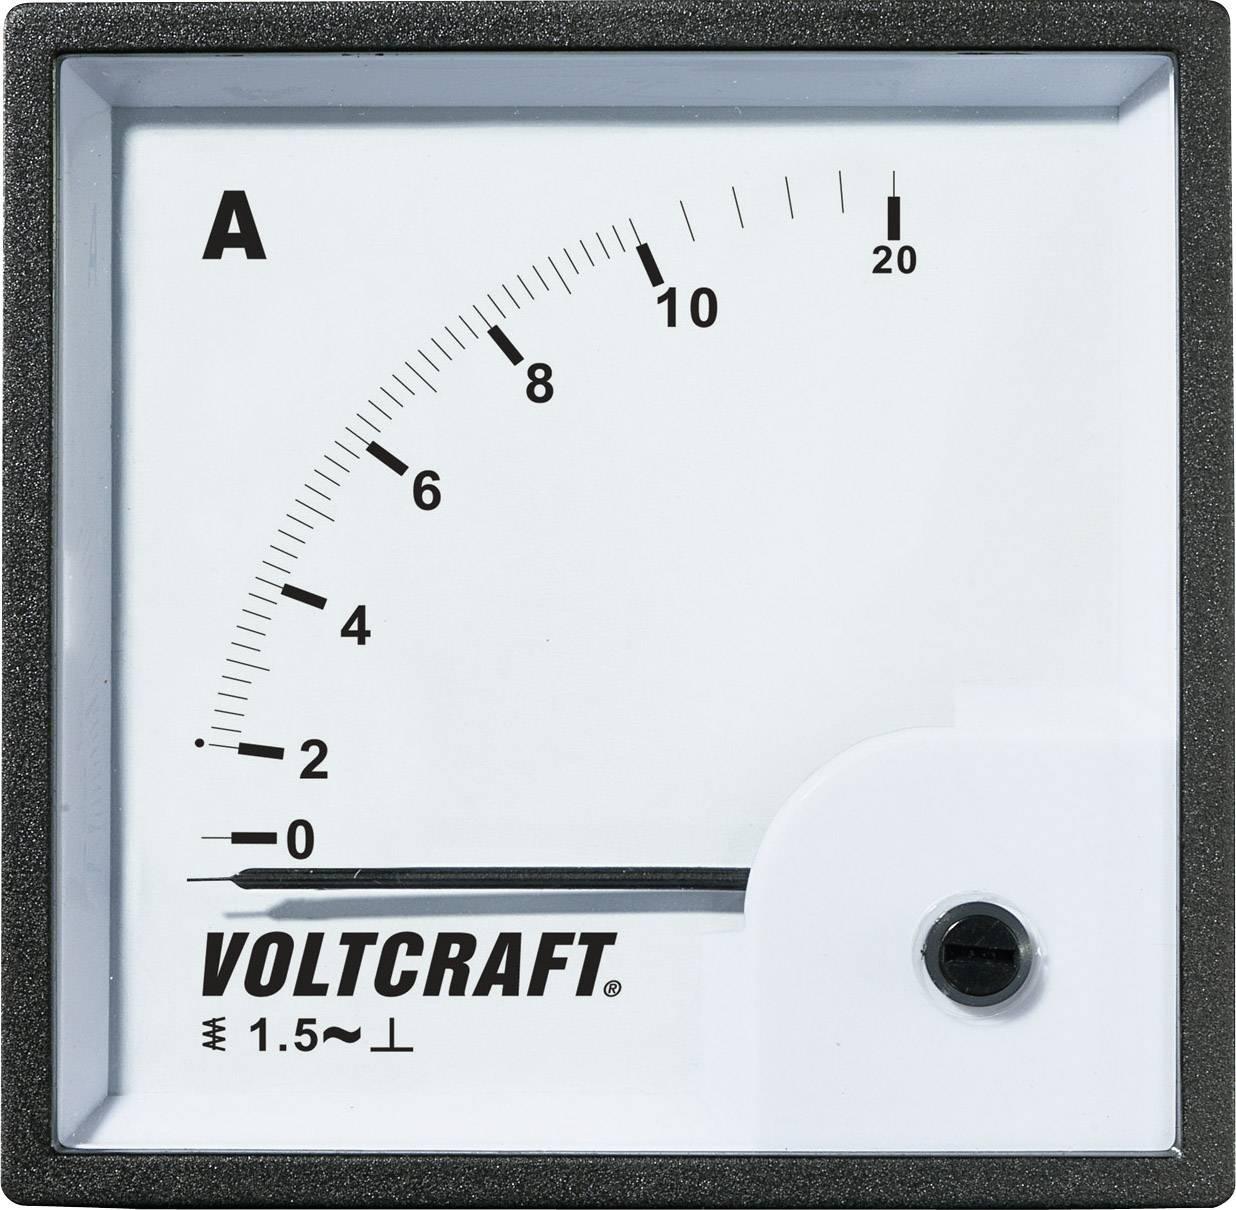 VOLTCRAFT AM-72X72/10A Analogni ugradbeni mjerni uređaj  10 A pomično željezo